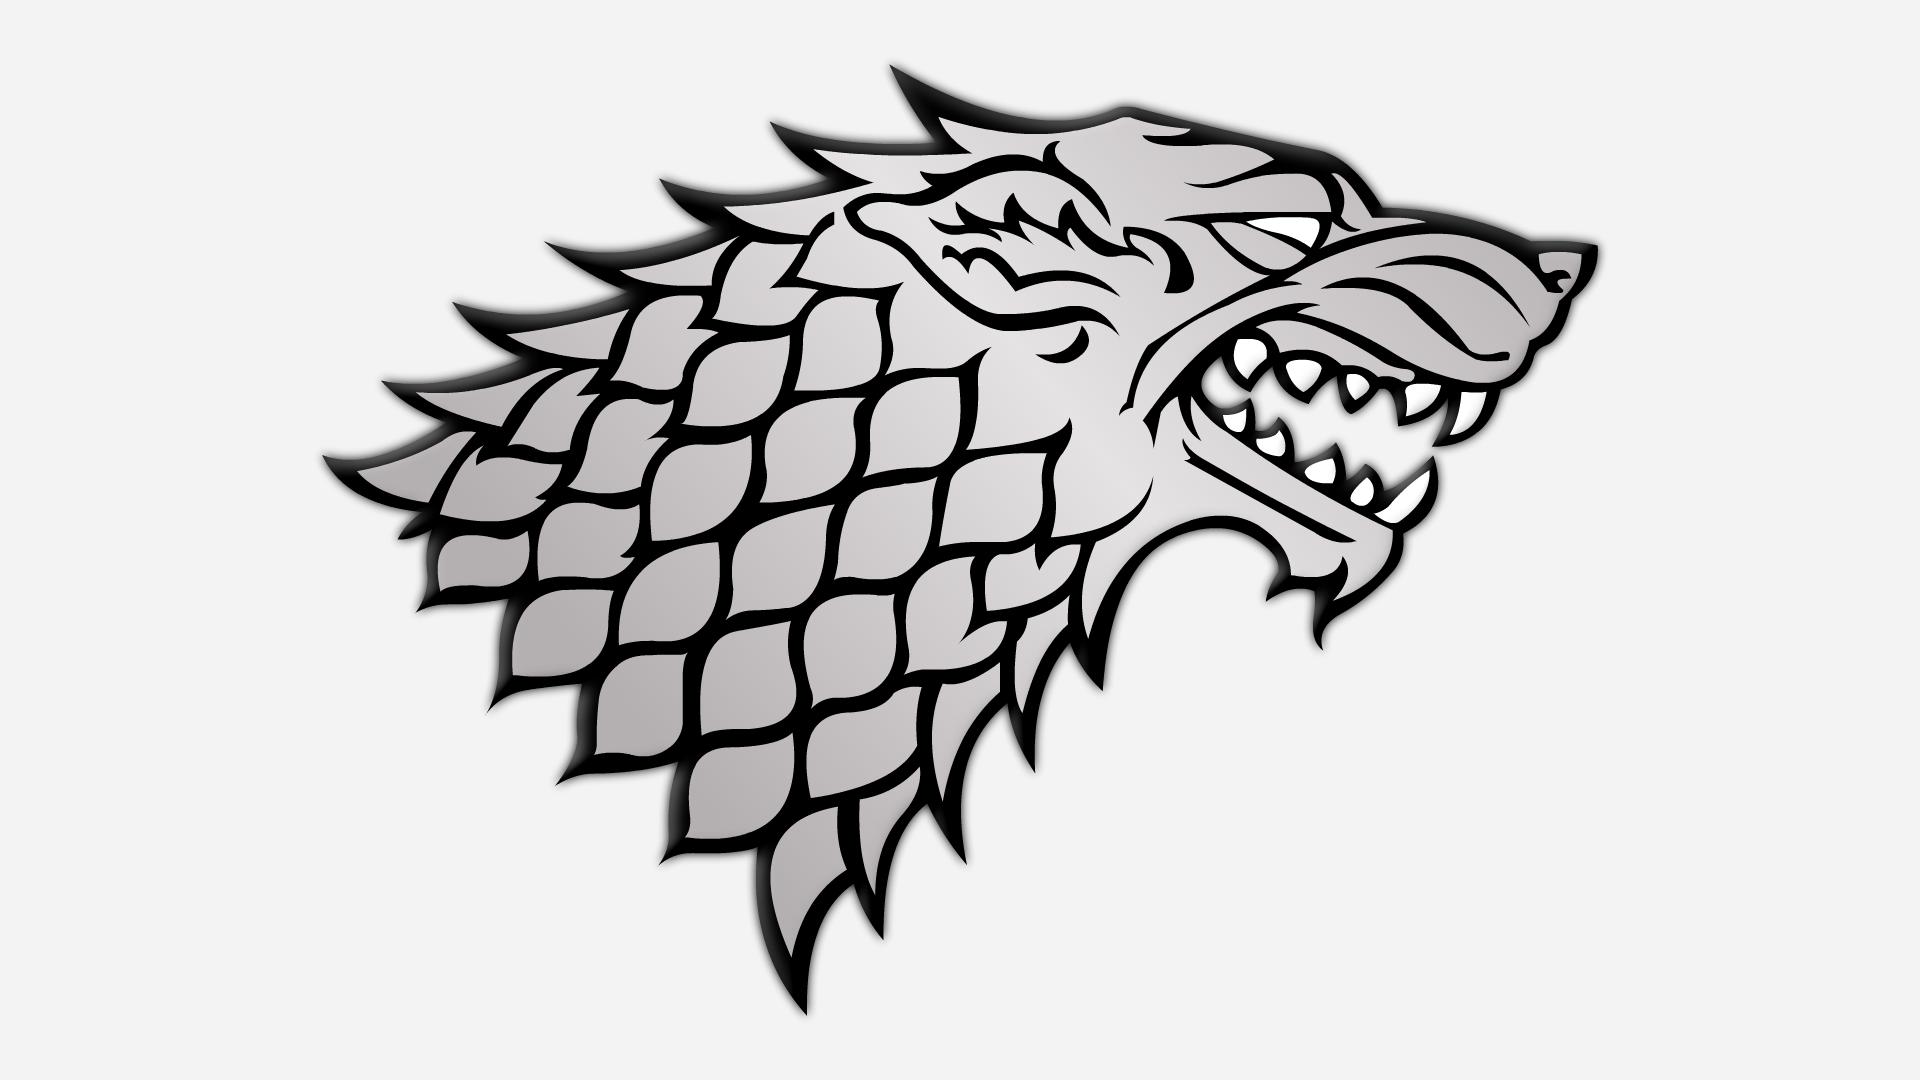 1920x1080 House Stark Logos